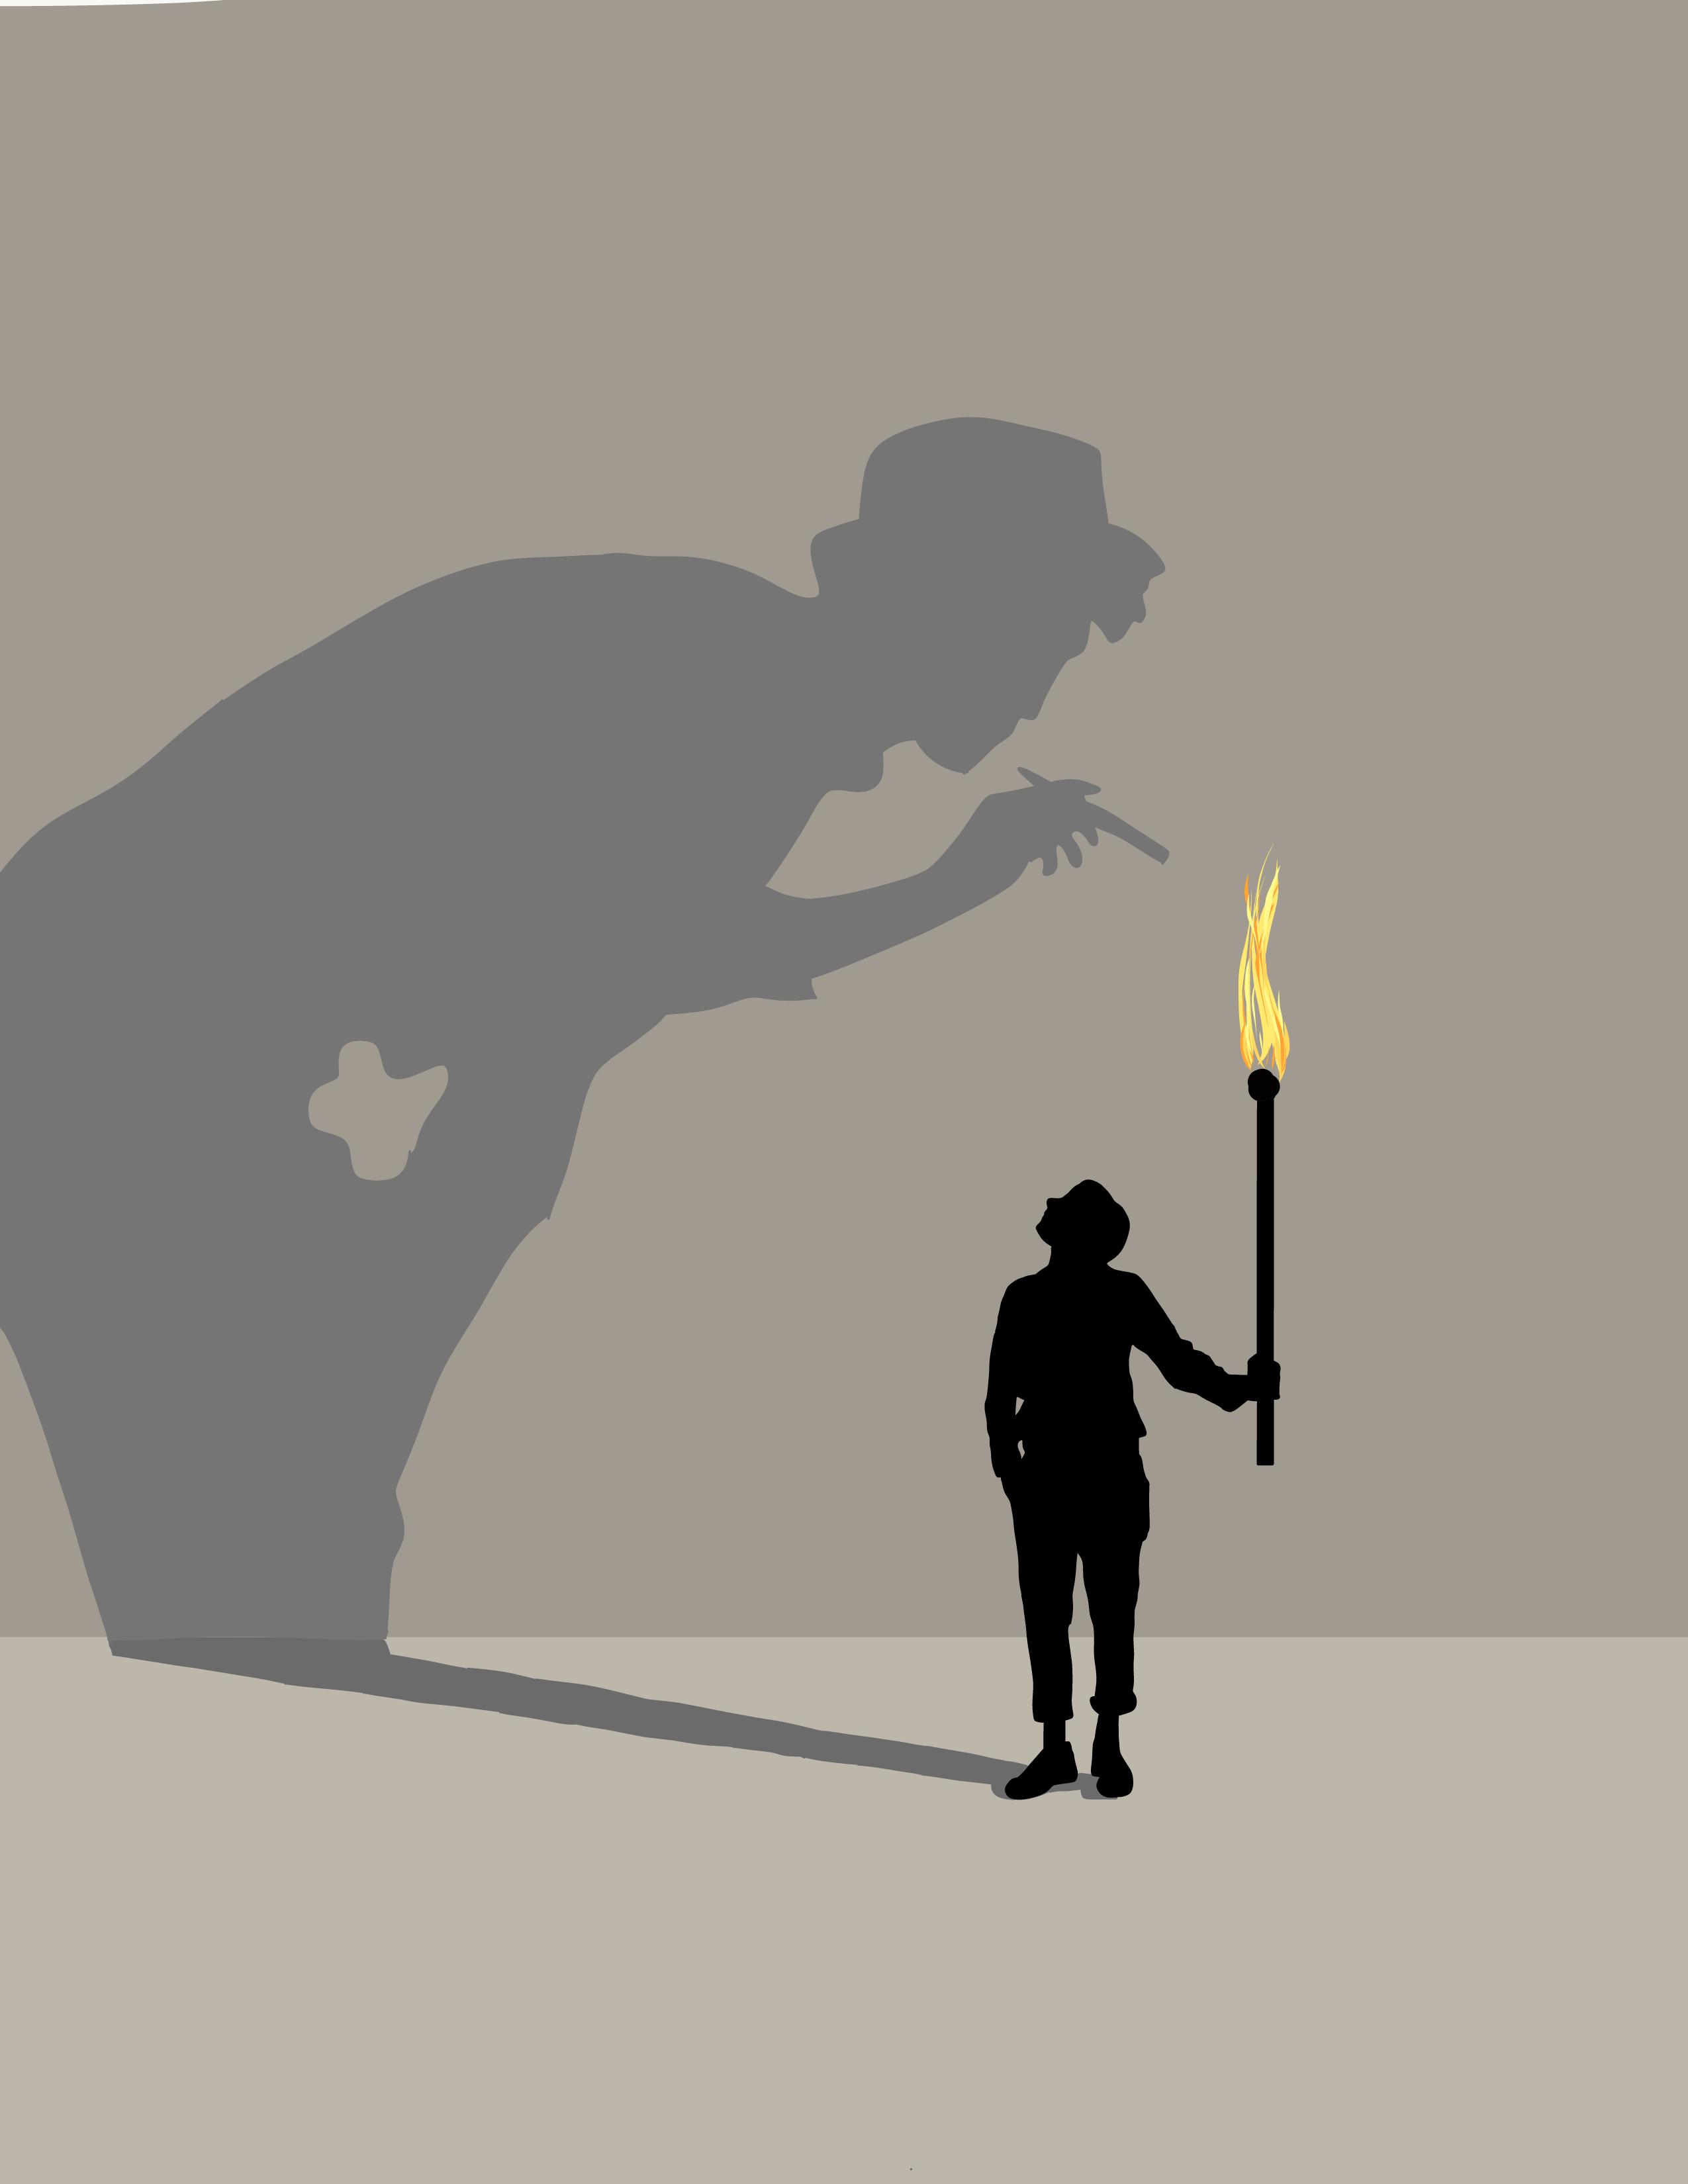 Creative art illustration